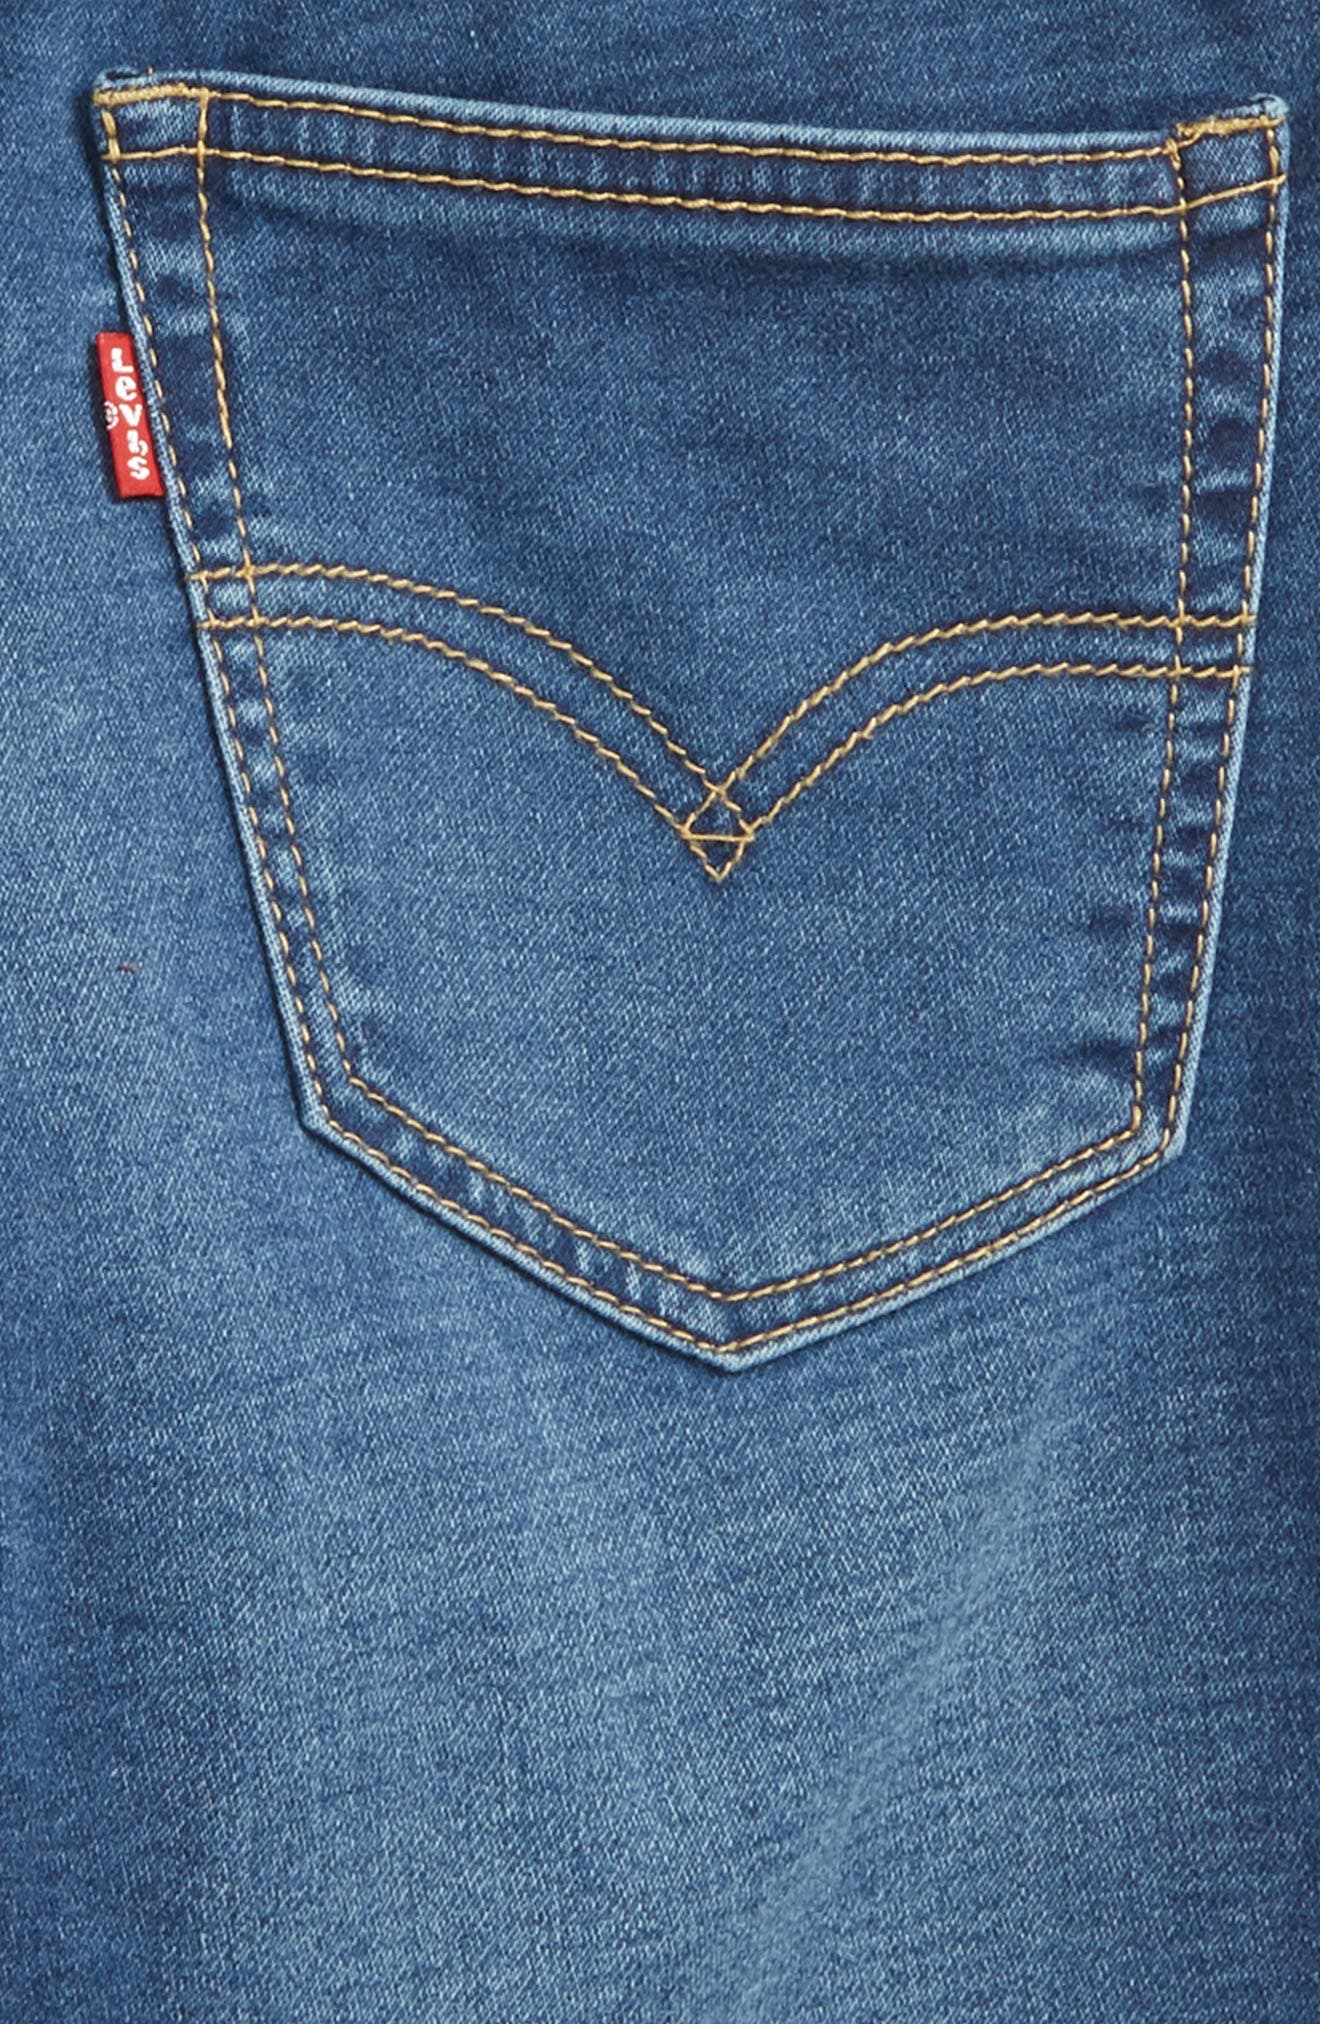 Levi's Super Chill Denim Shorts,                             Alternate thumbnail 3, color,                             421